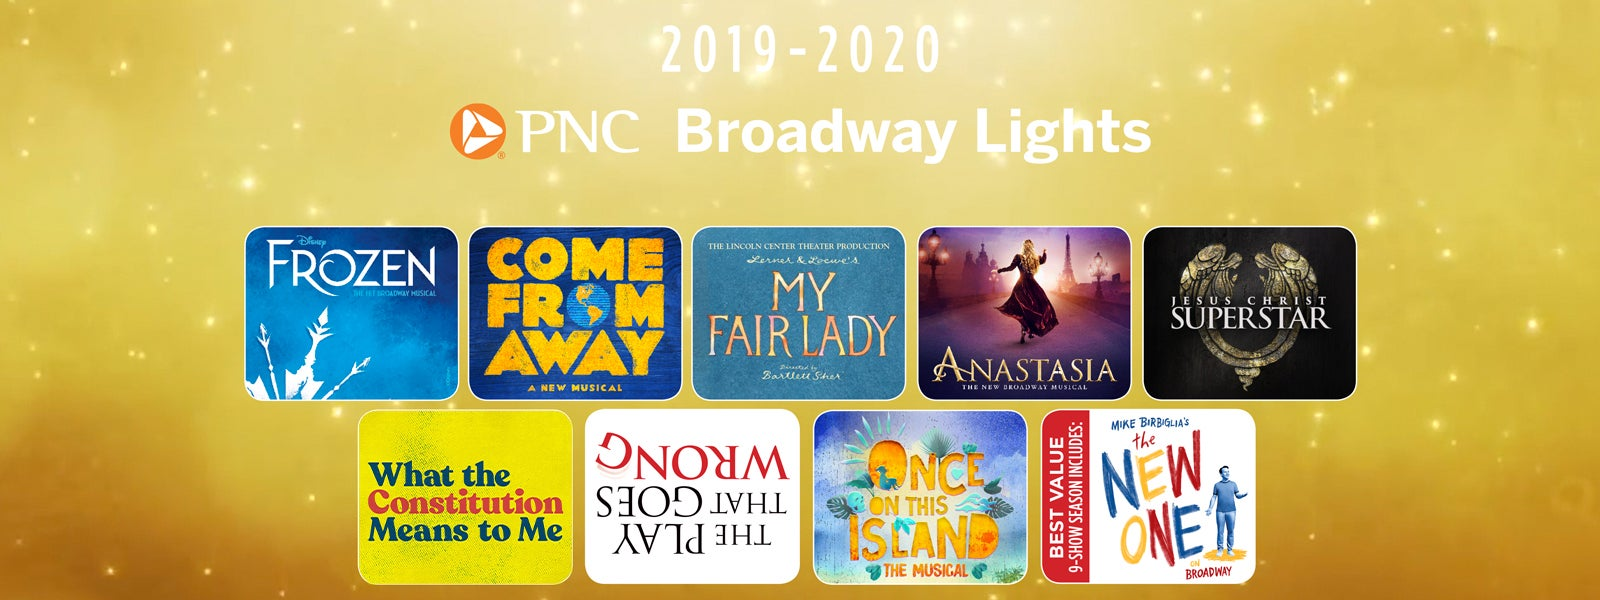 Blumenthal Schedule 2020 PNC Broadway Lights | Blumenthal Performing Arts